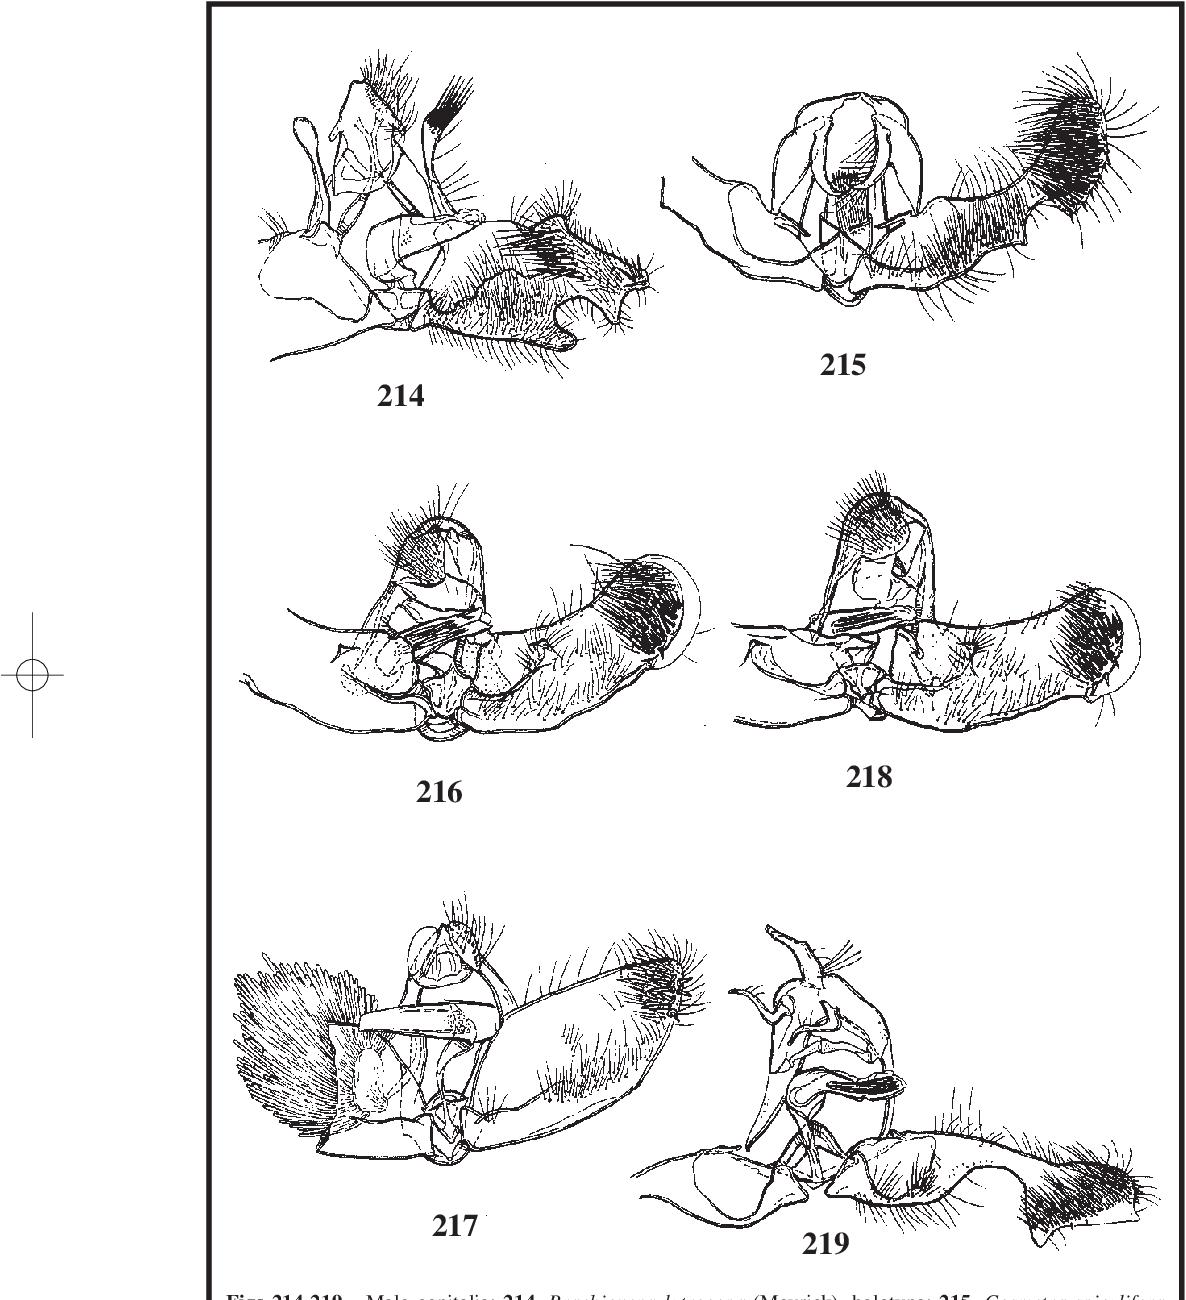 figure 214-219